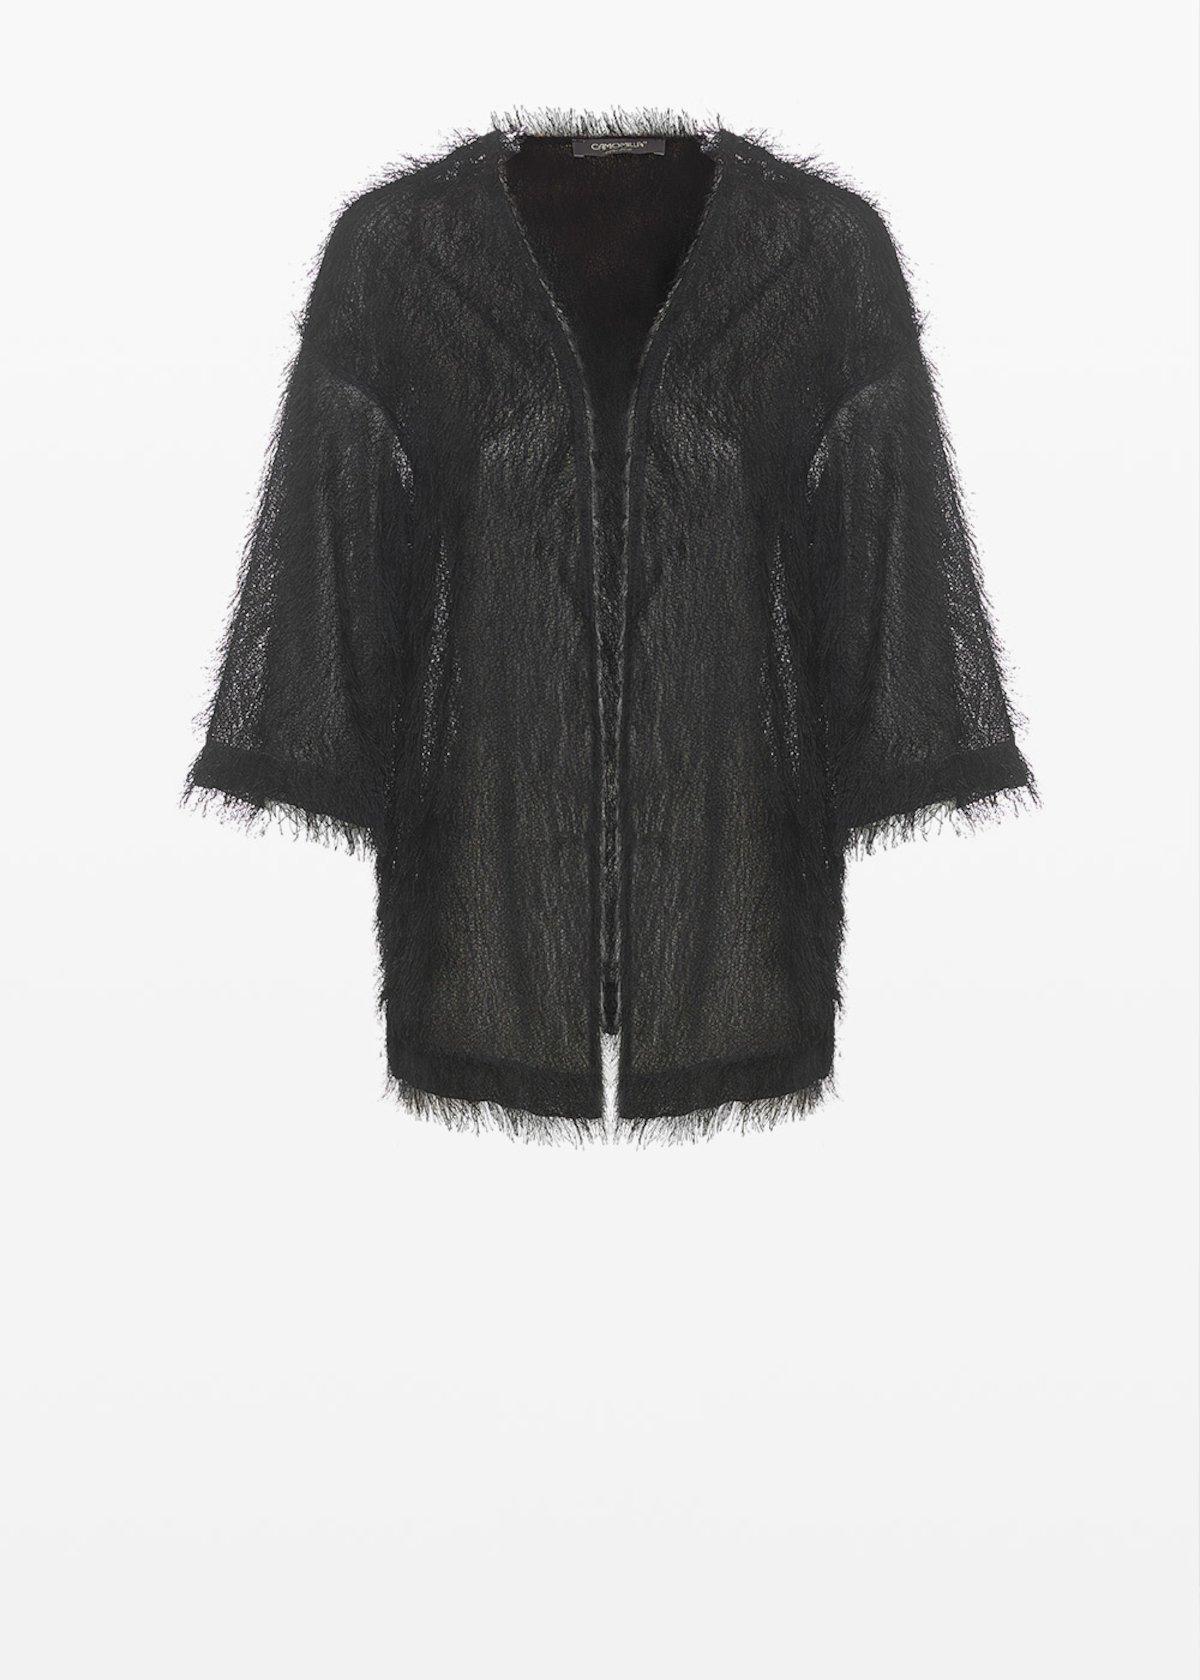 Craing faux fur unlined shrug - Black - Woman - Category image